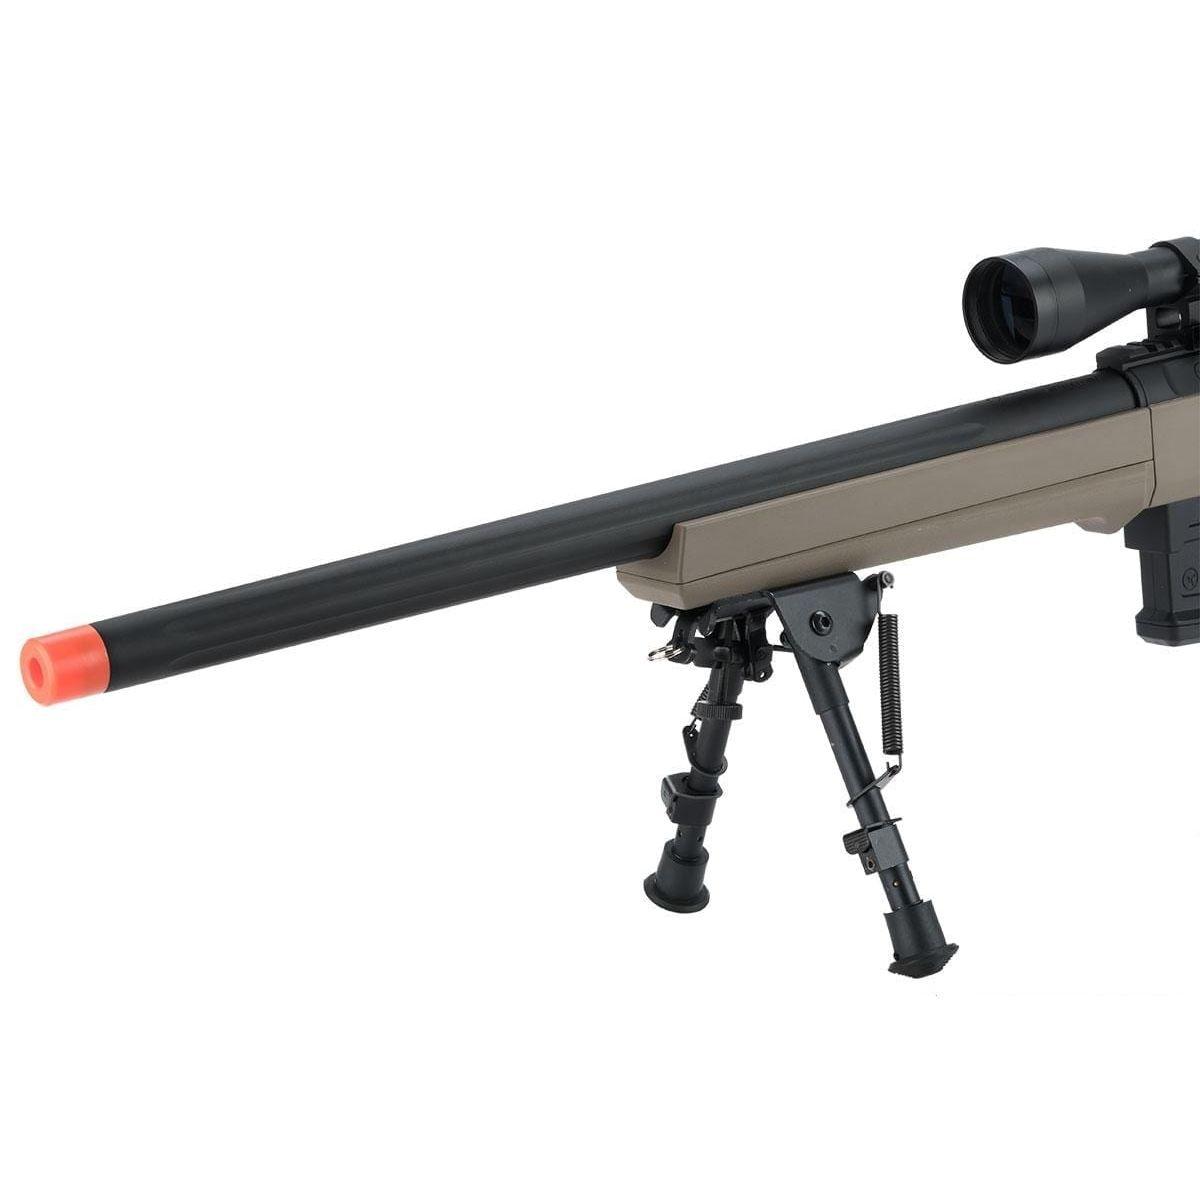 Gen2 S1 Bolt Action Sniper Rifle amoeba